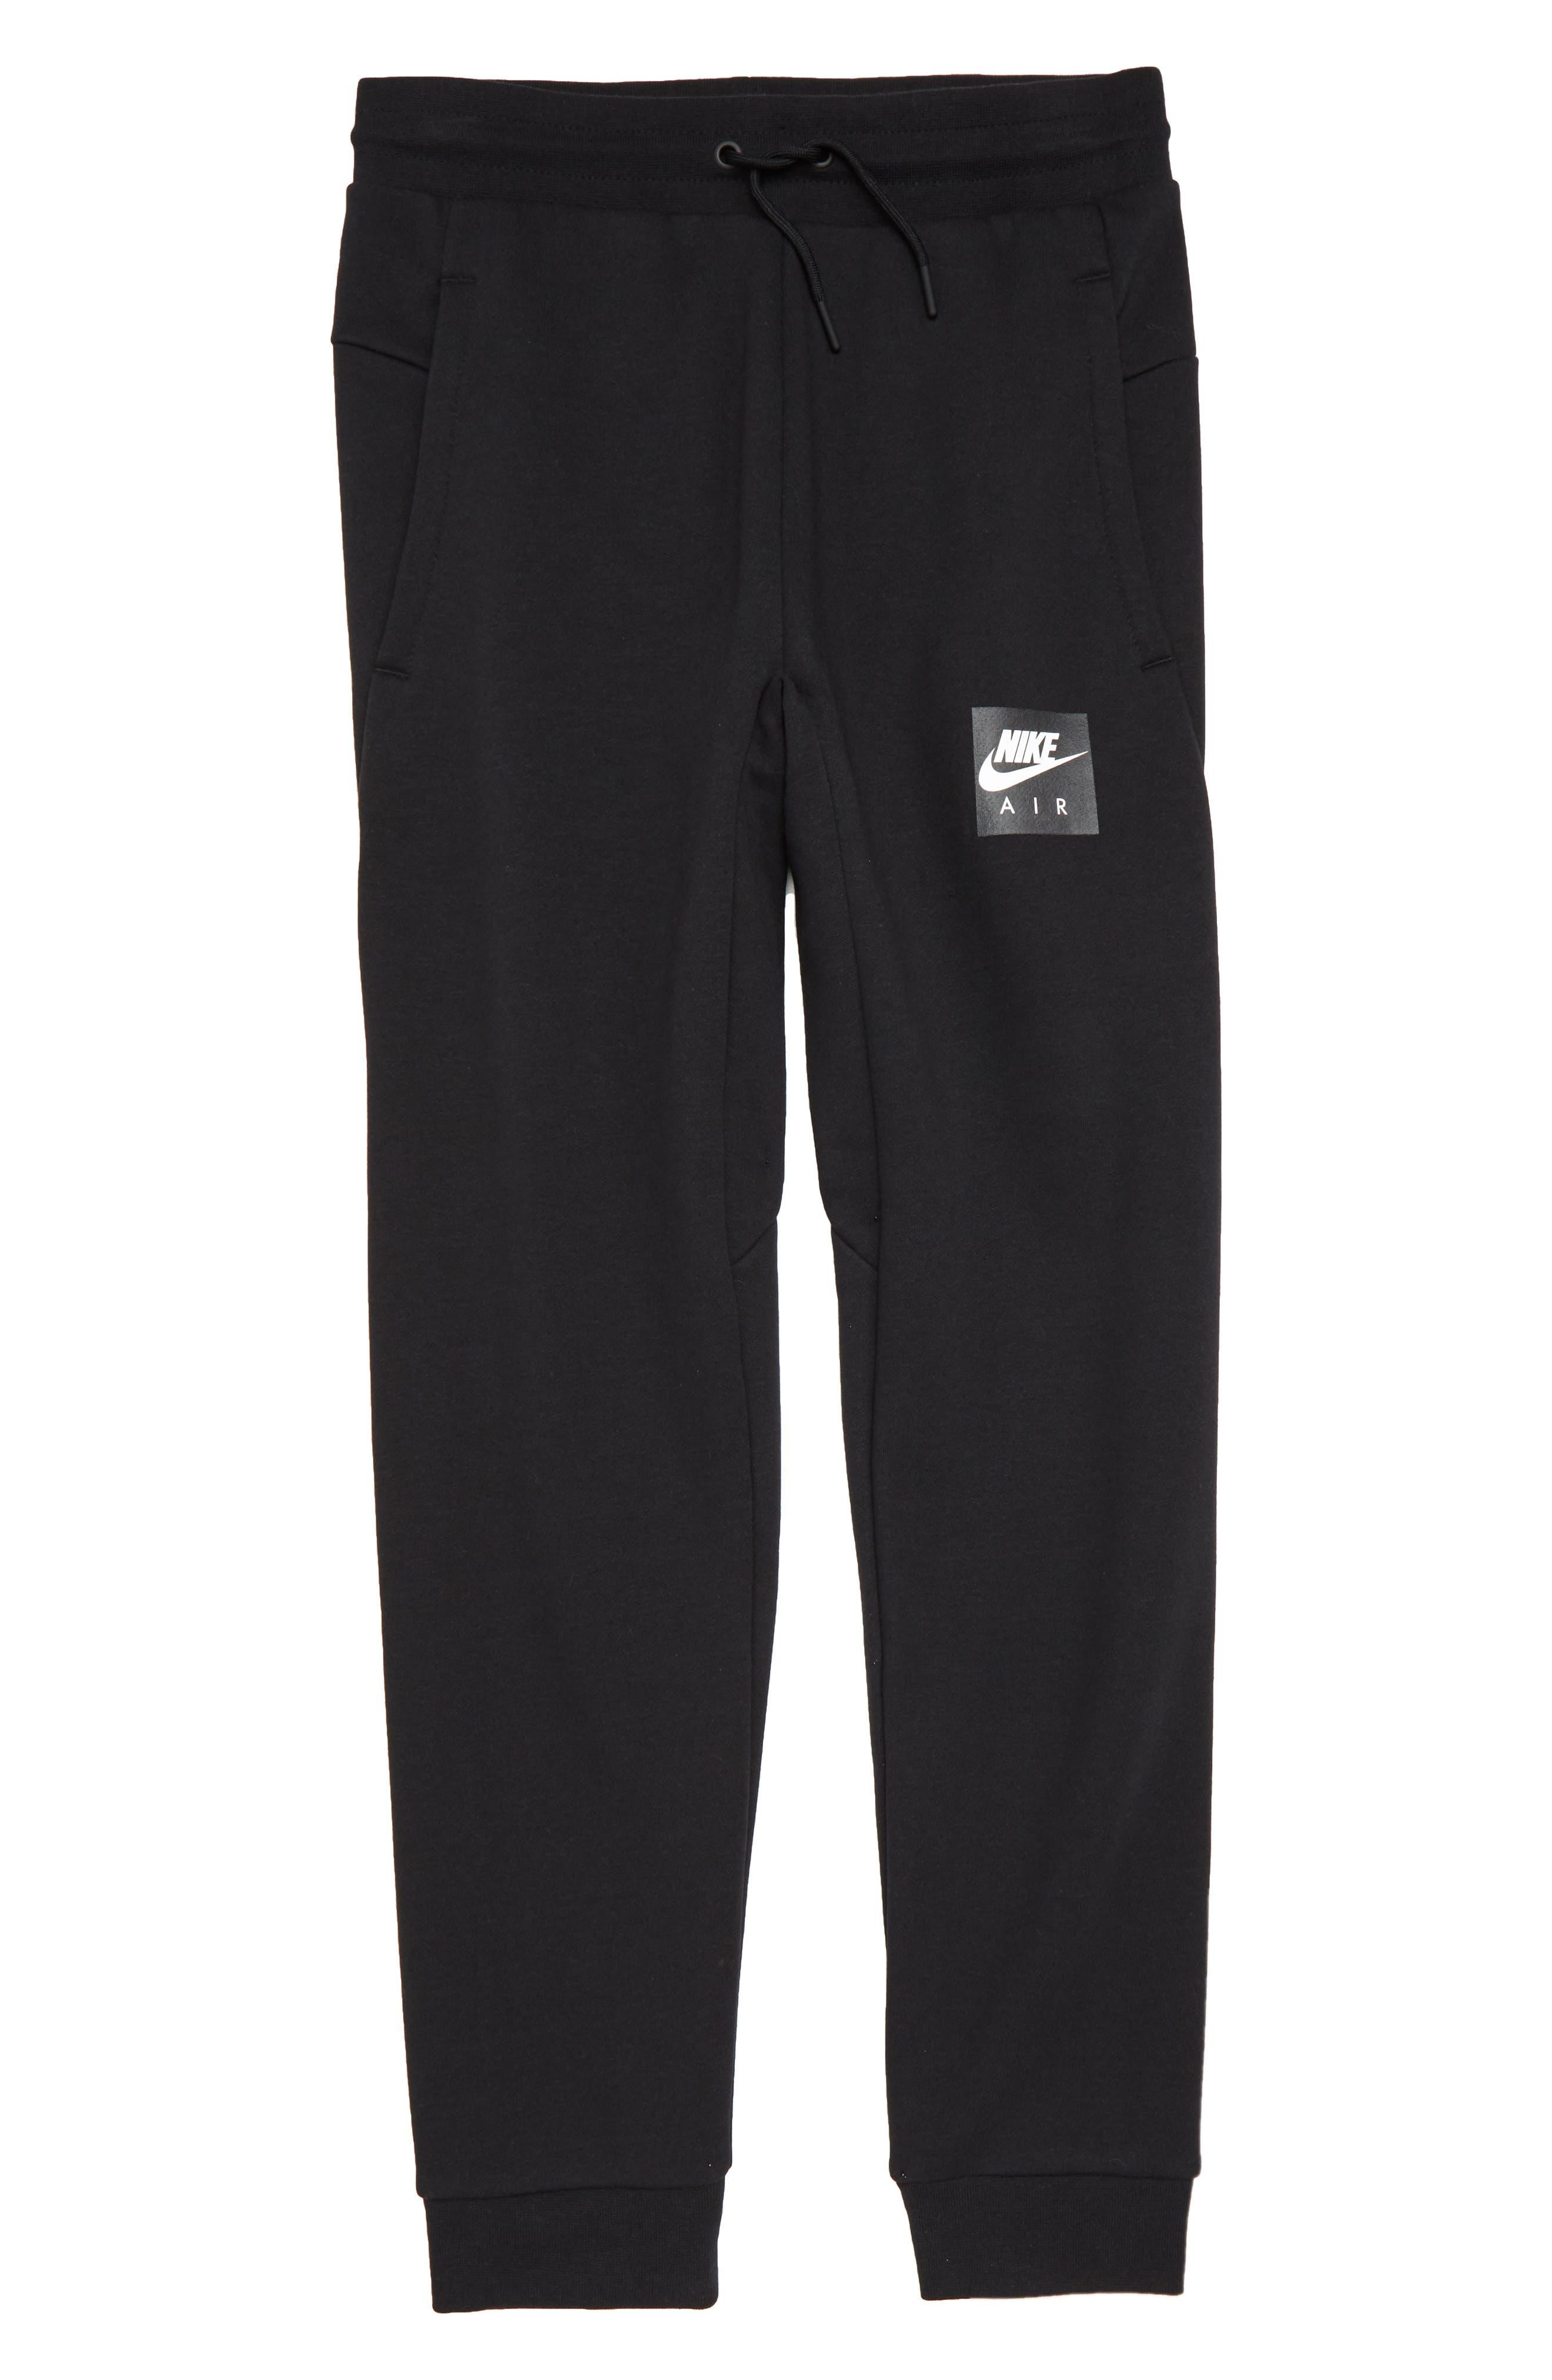 Air Fleece Jogger Pants,                         Main,                         color, Black